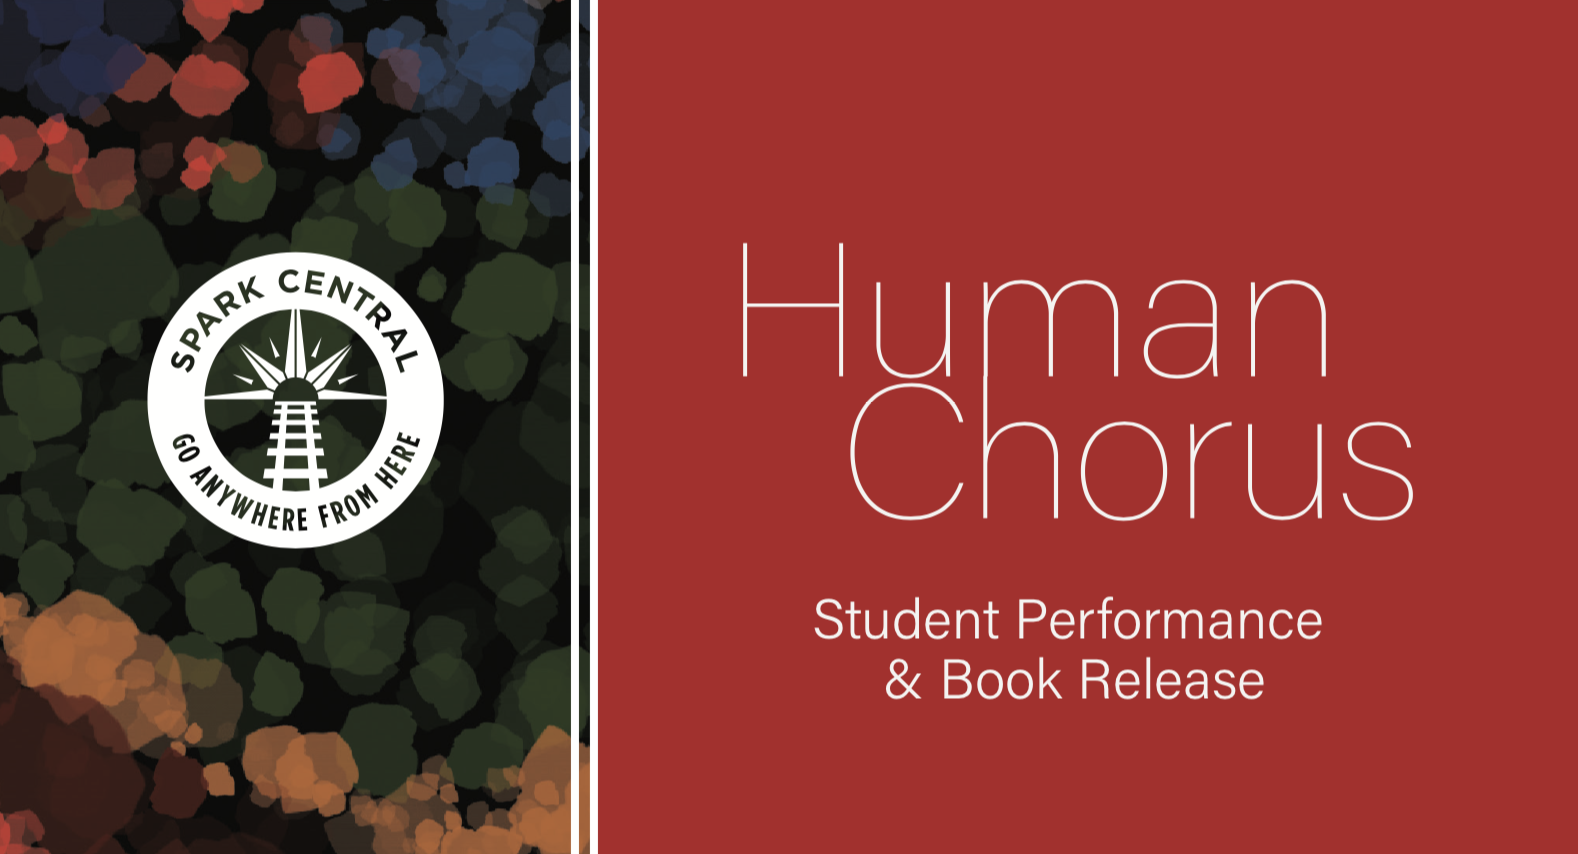 The Human Chorus